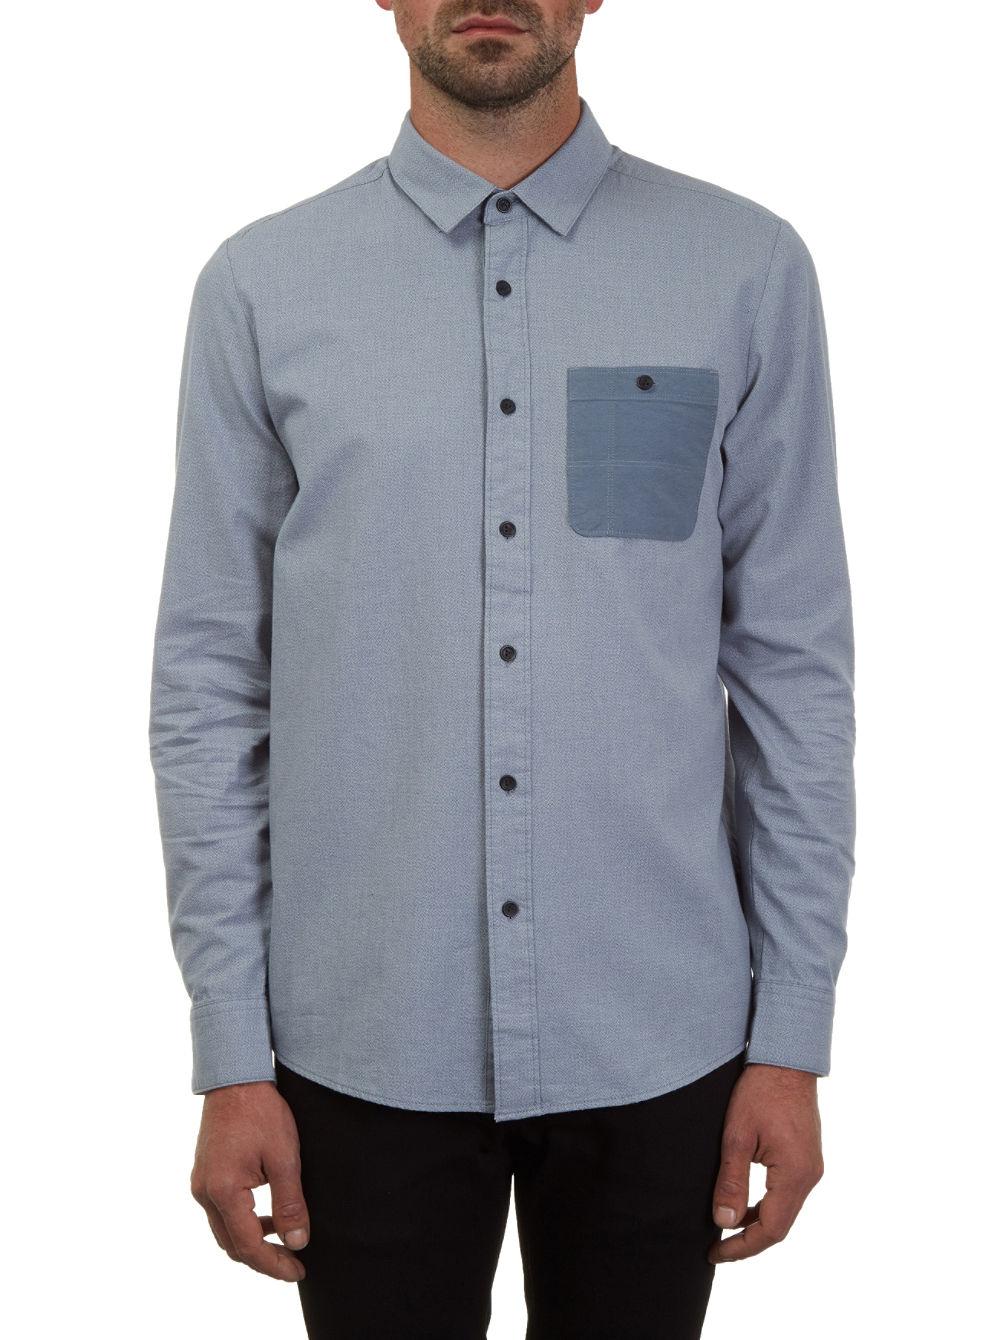 volcom-hadley-solid-shirt-ls